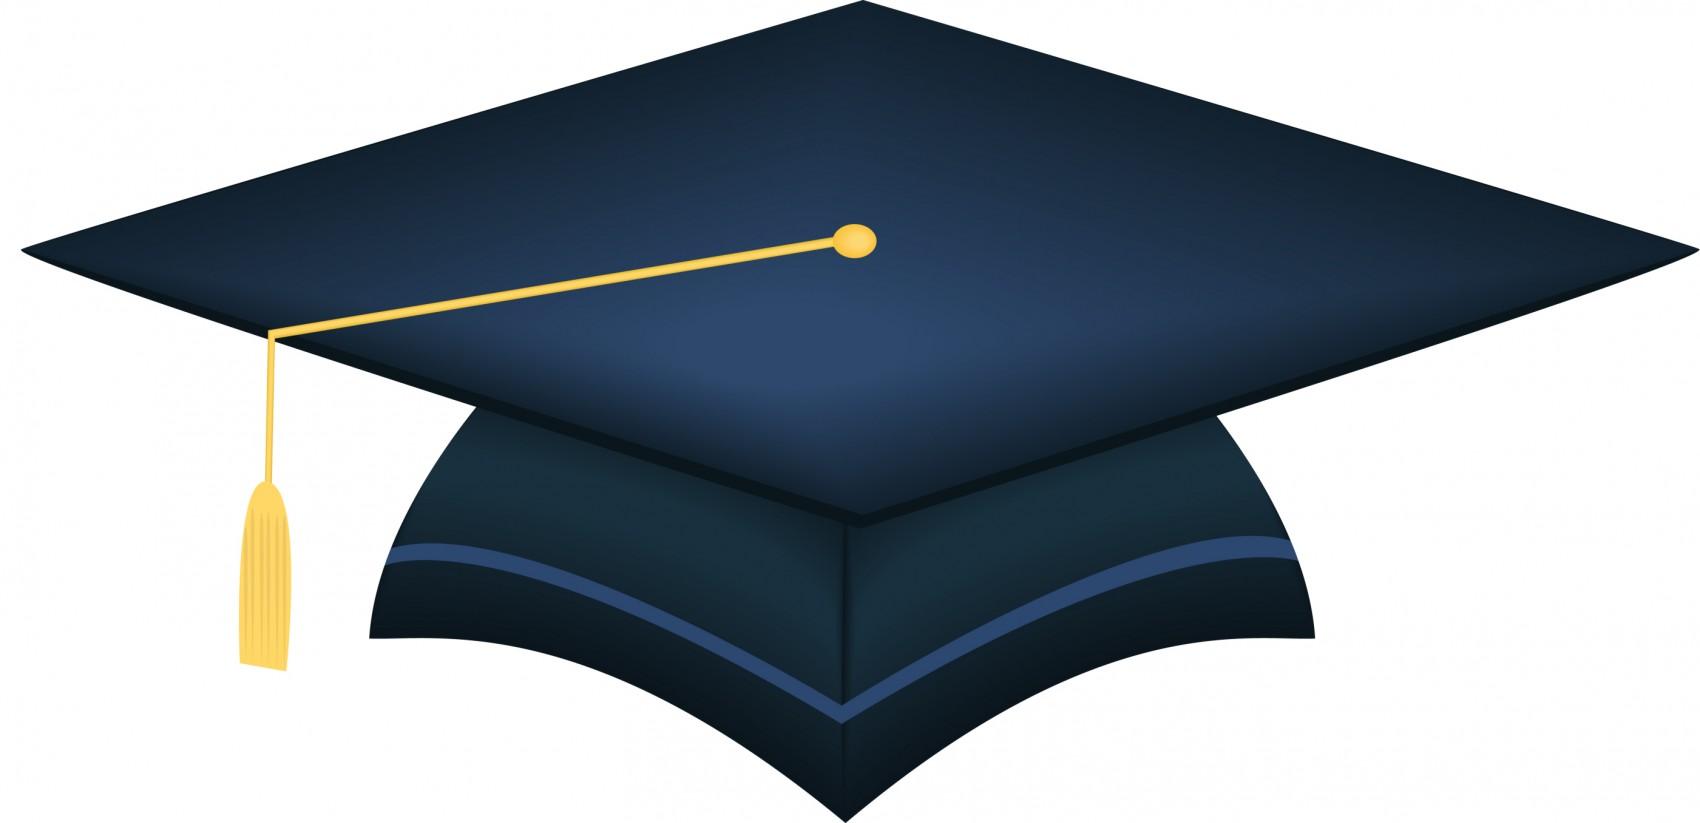 1700x823 Outstanding Graduation Cap Clipart Hat Free Clip Art Of A Image 2